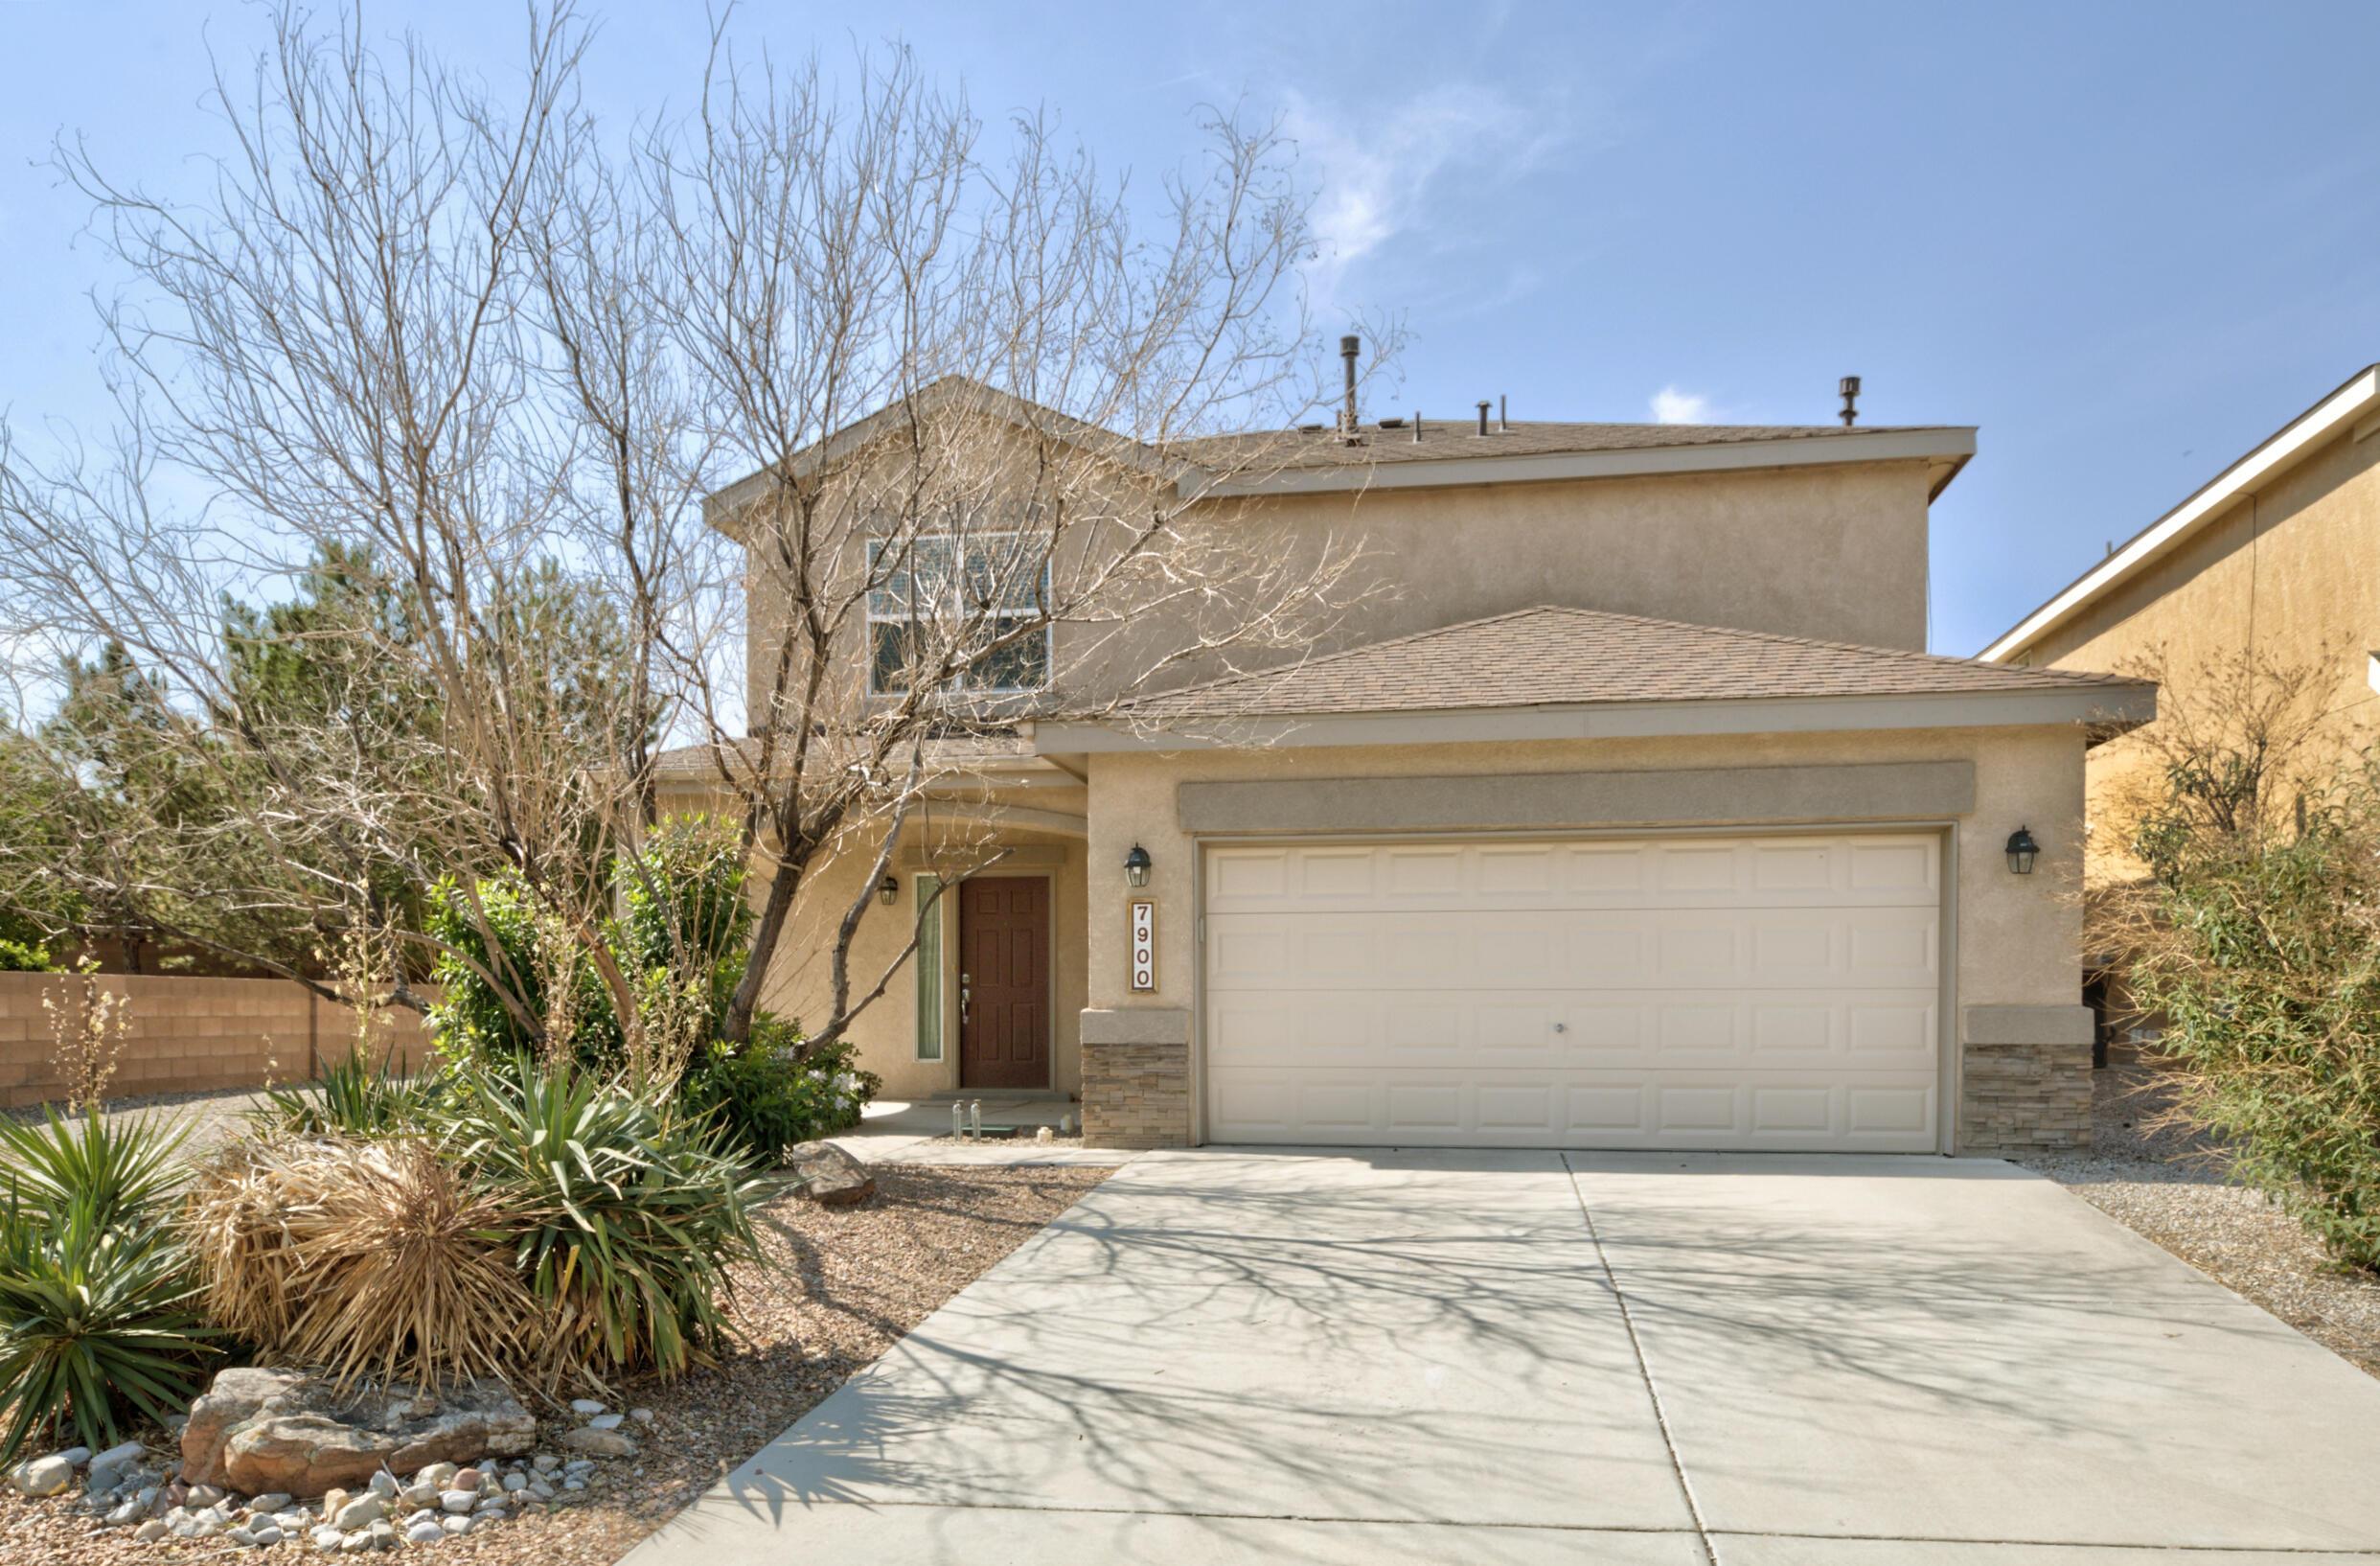 7900 Sierra Altos Place Nw Property Photo